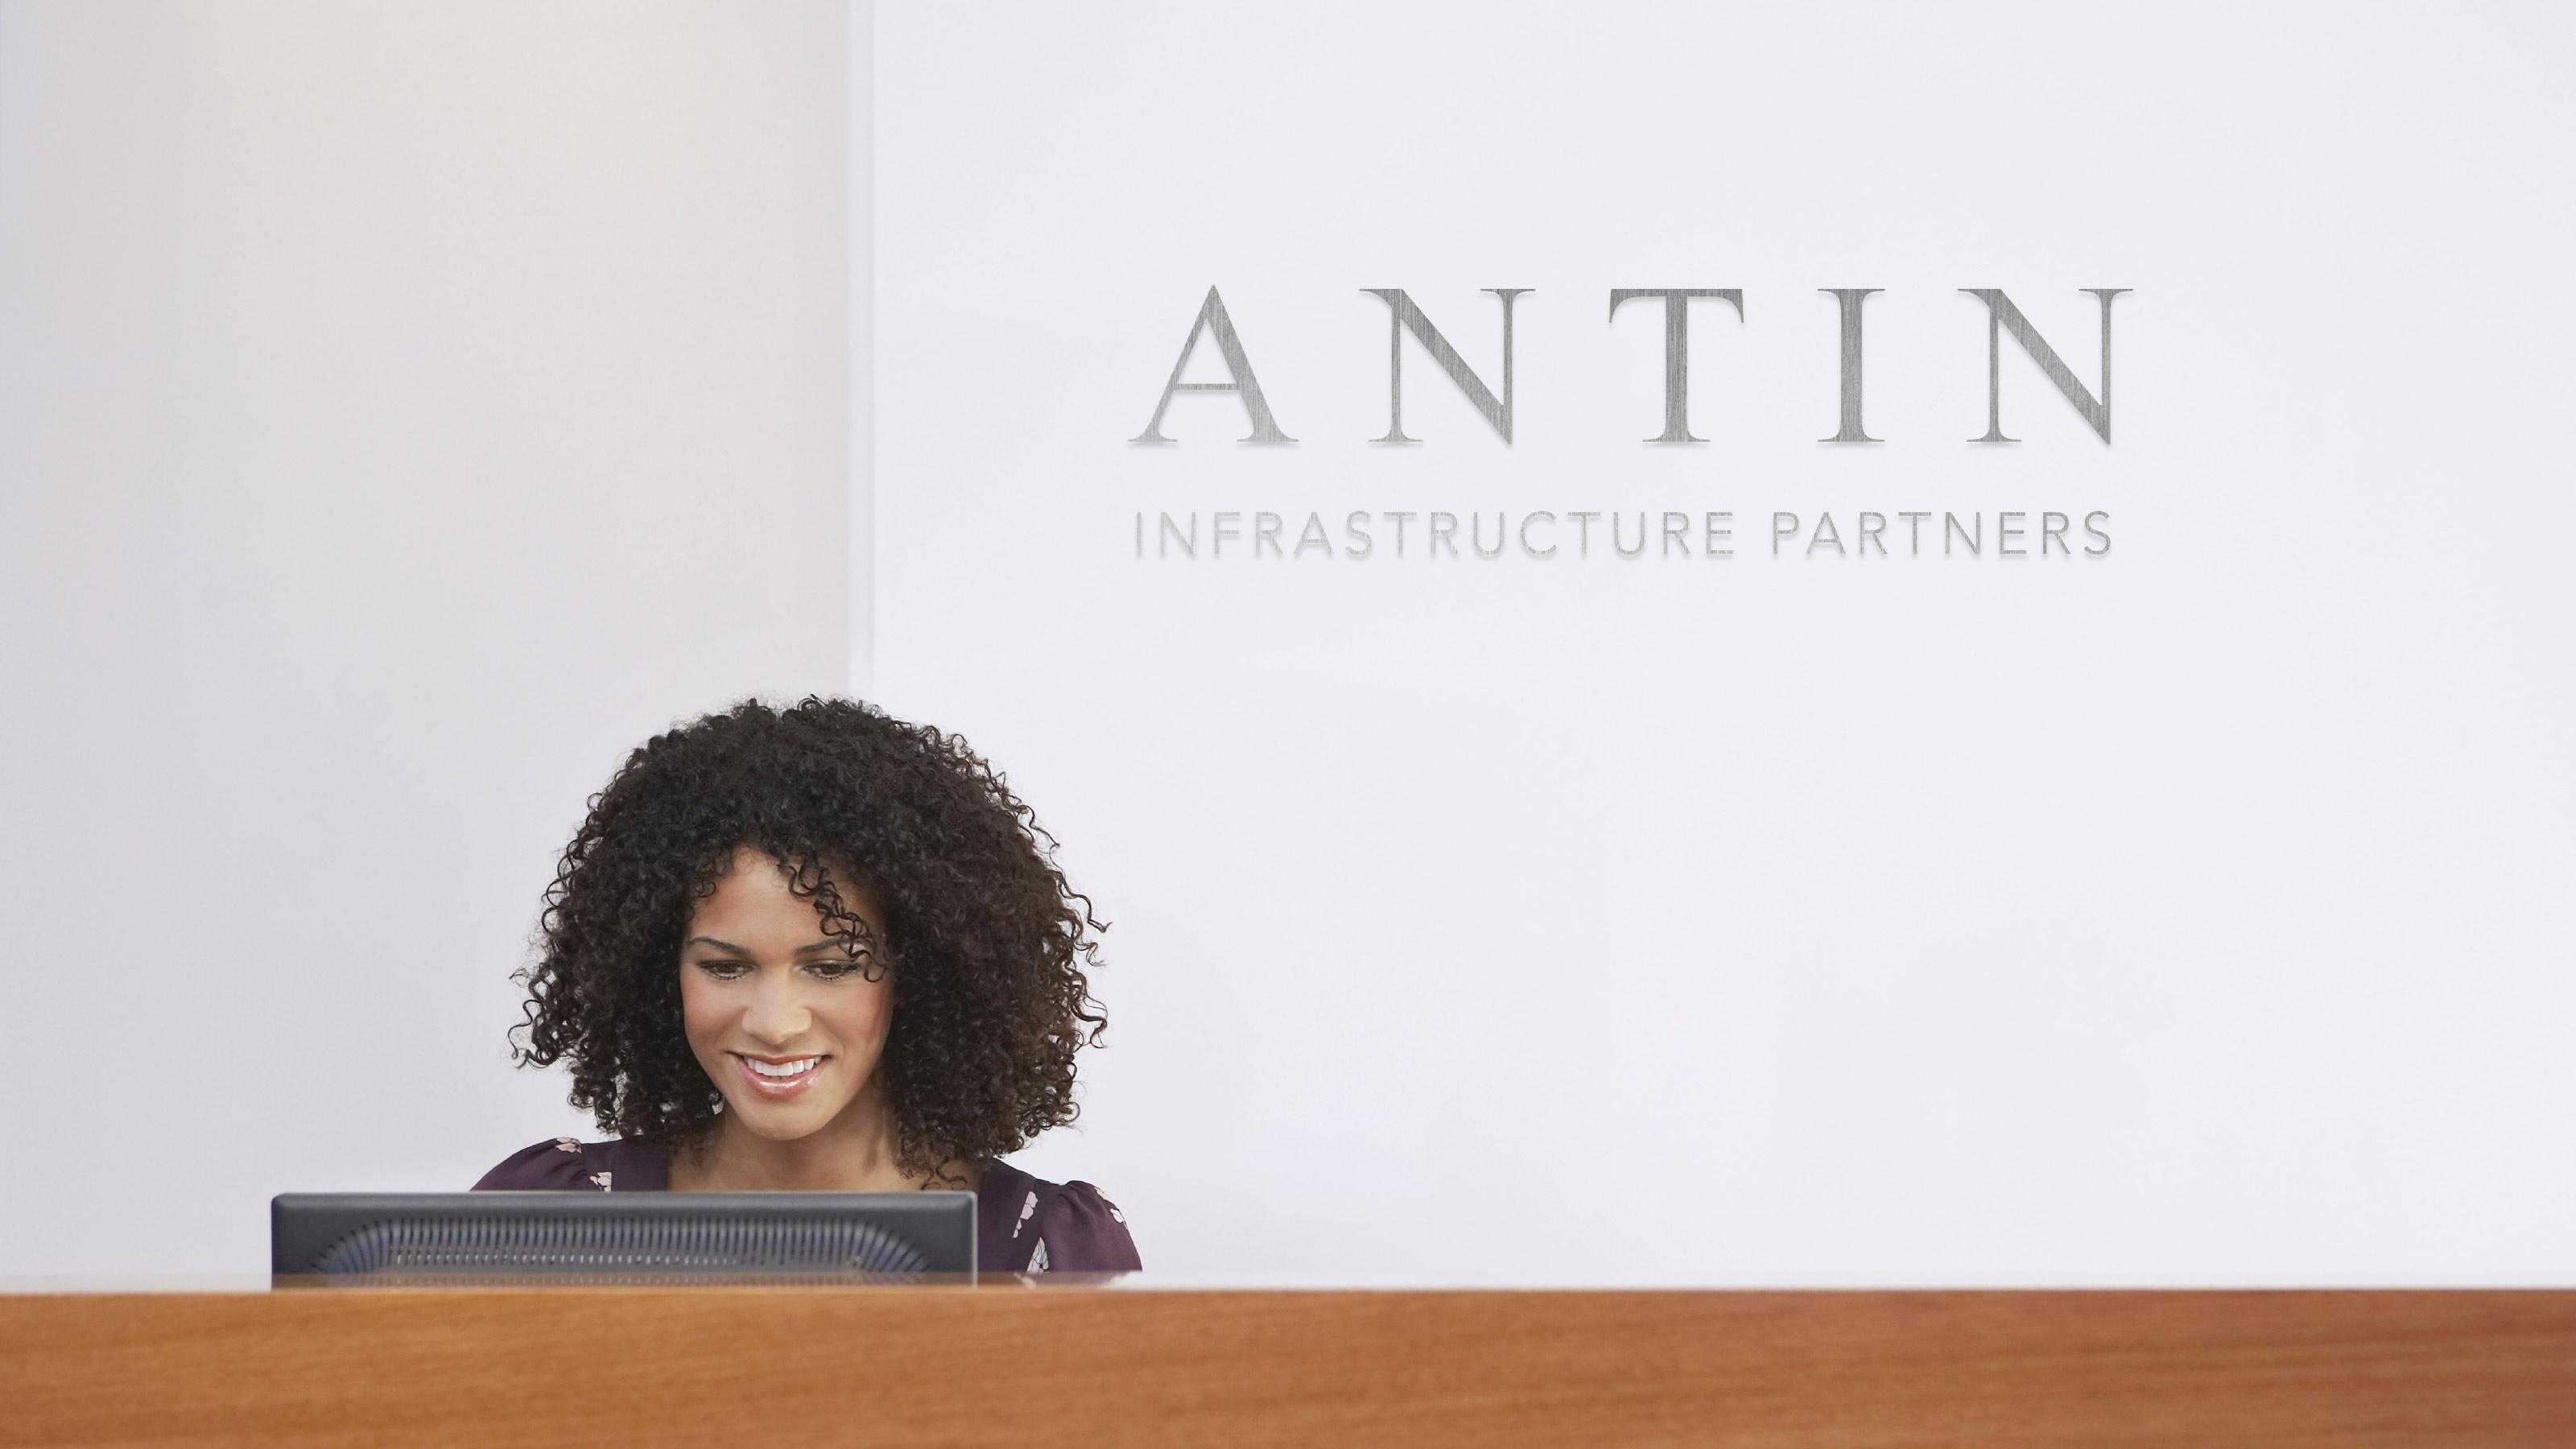 Brand logo wall Antin